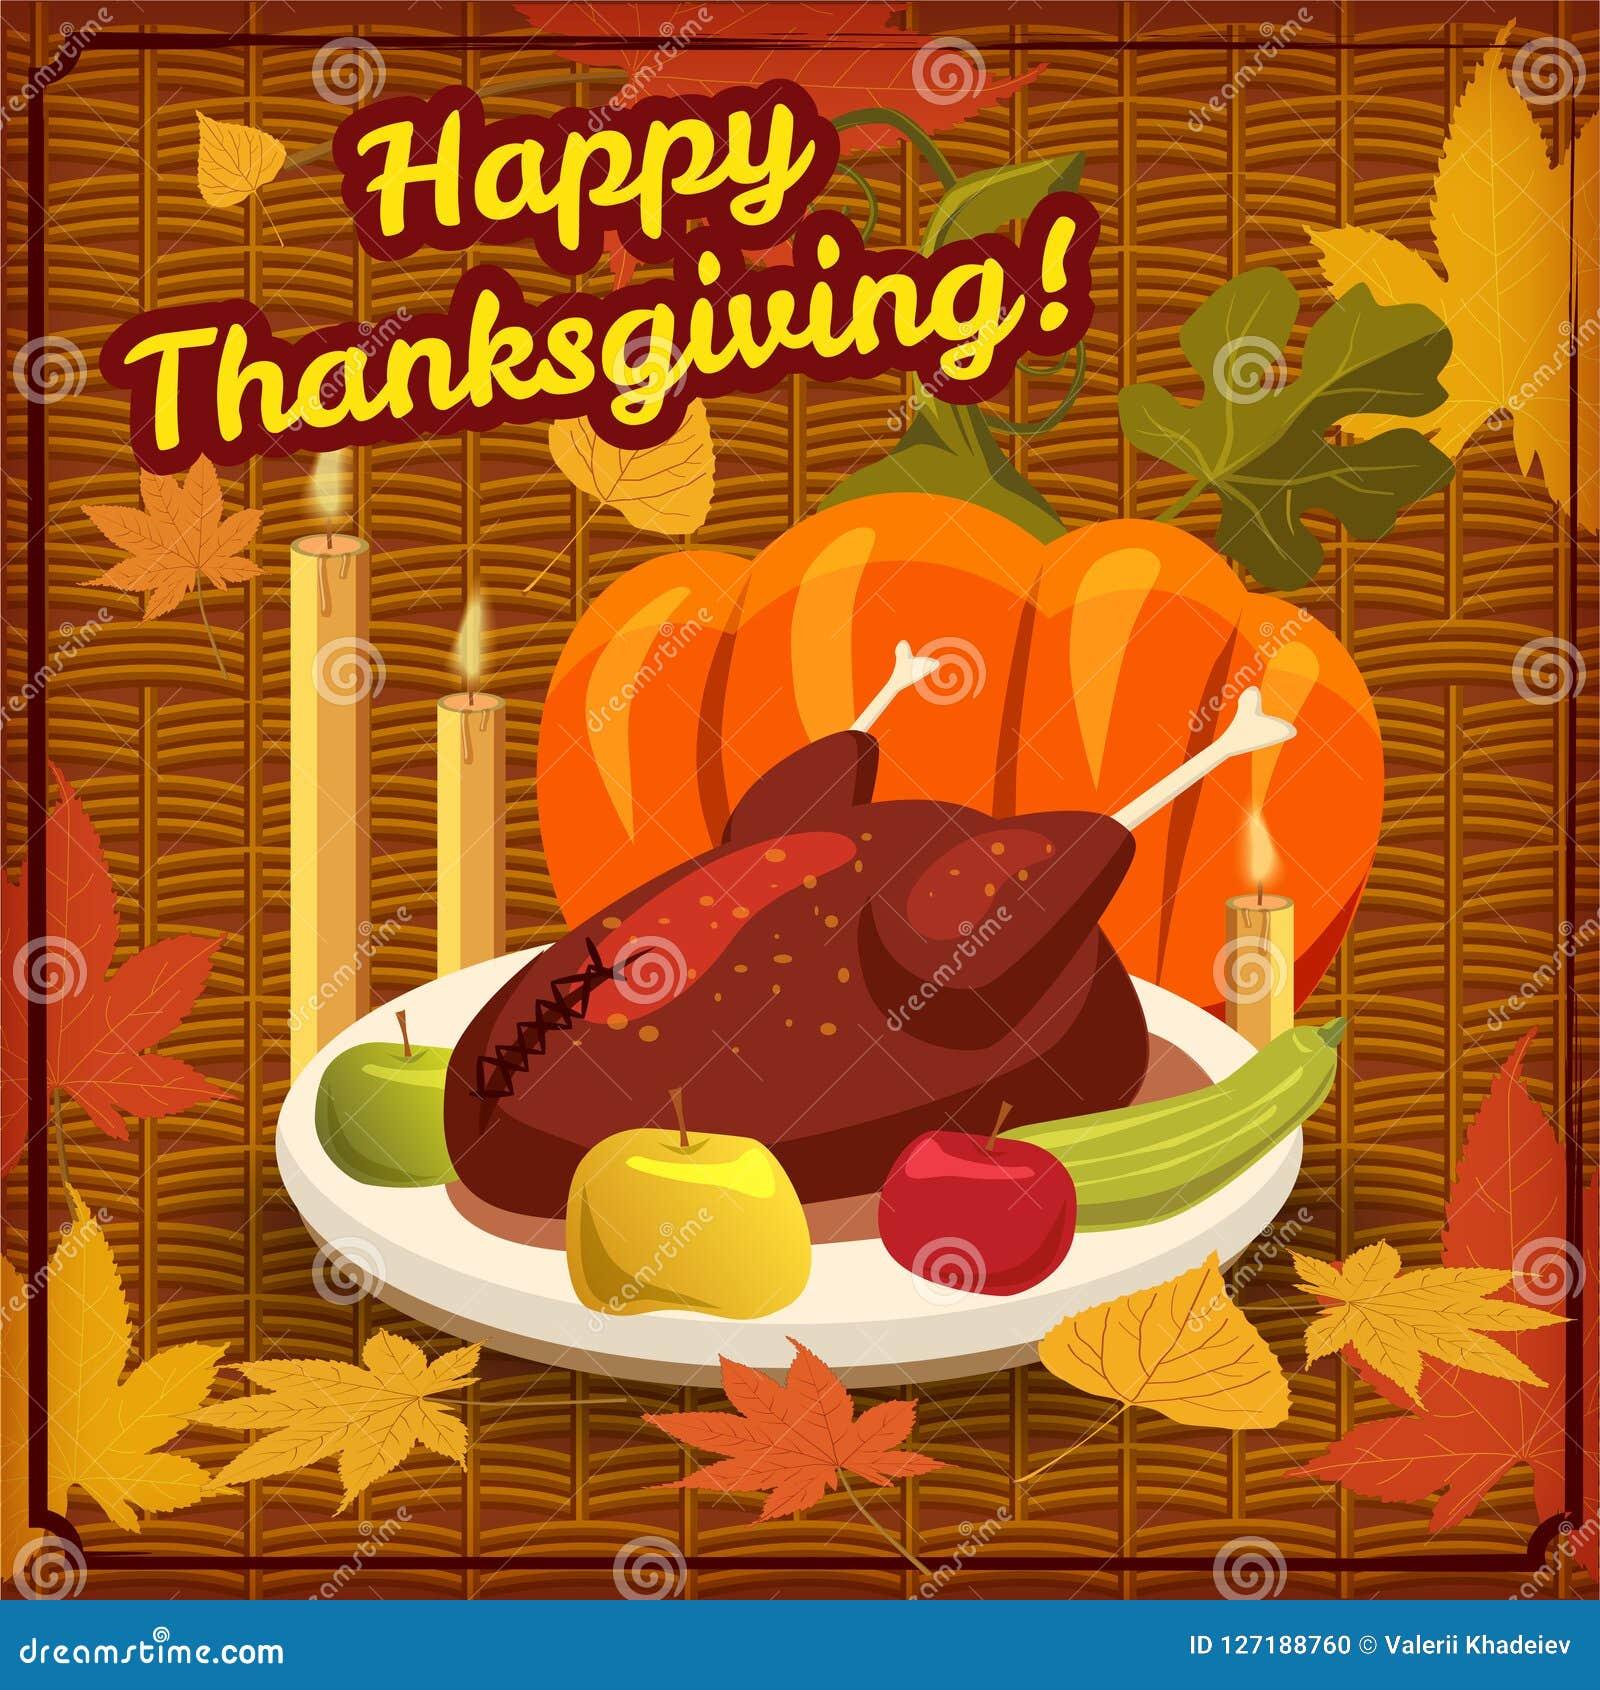 happy thanksgiving card festive dinner turkey pumpkin apples